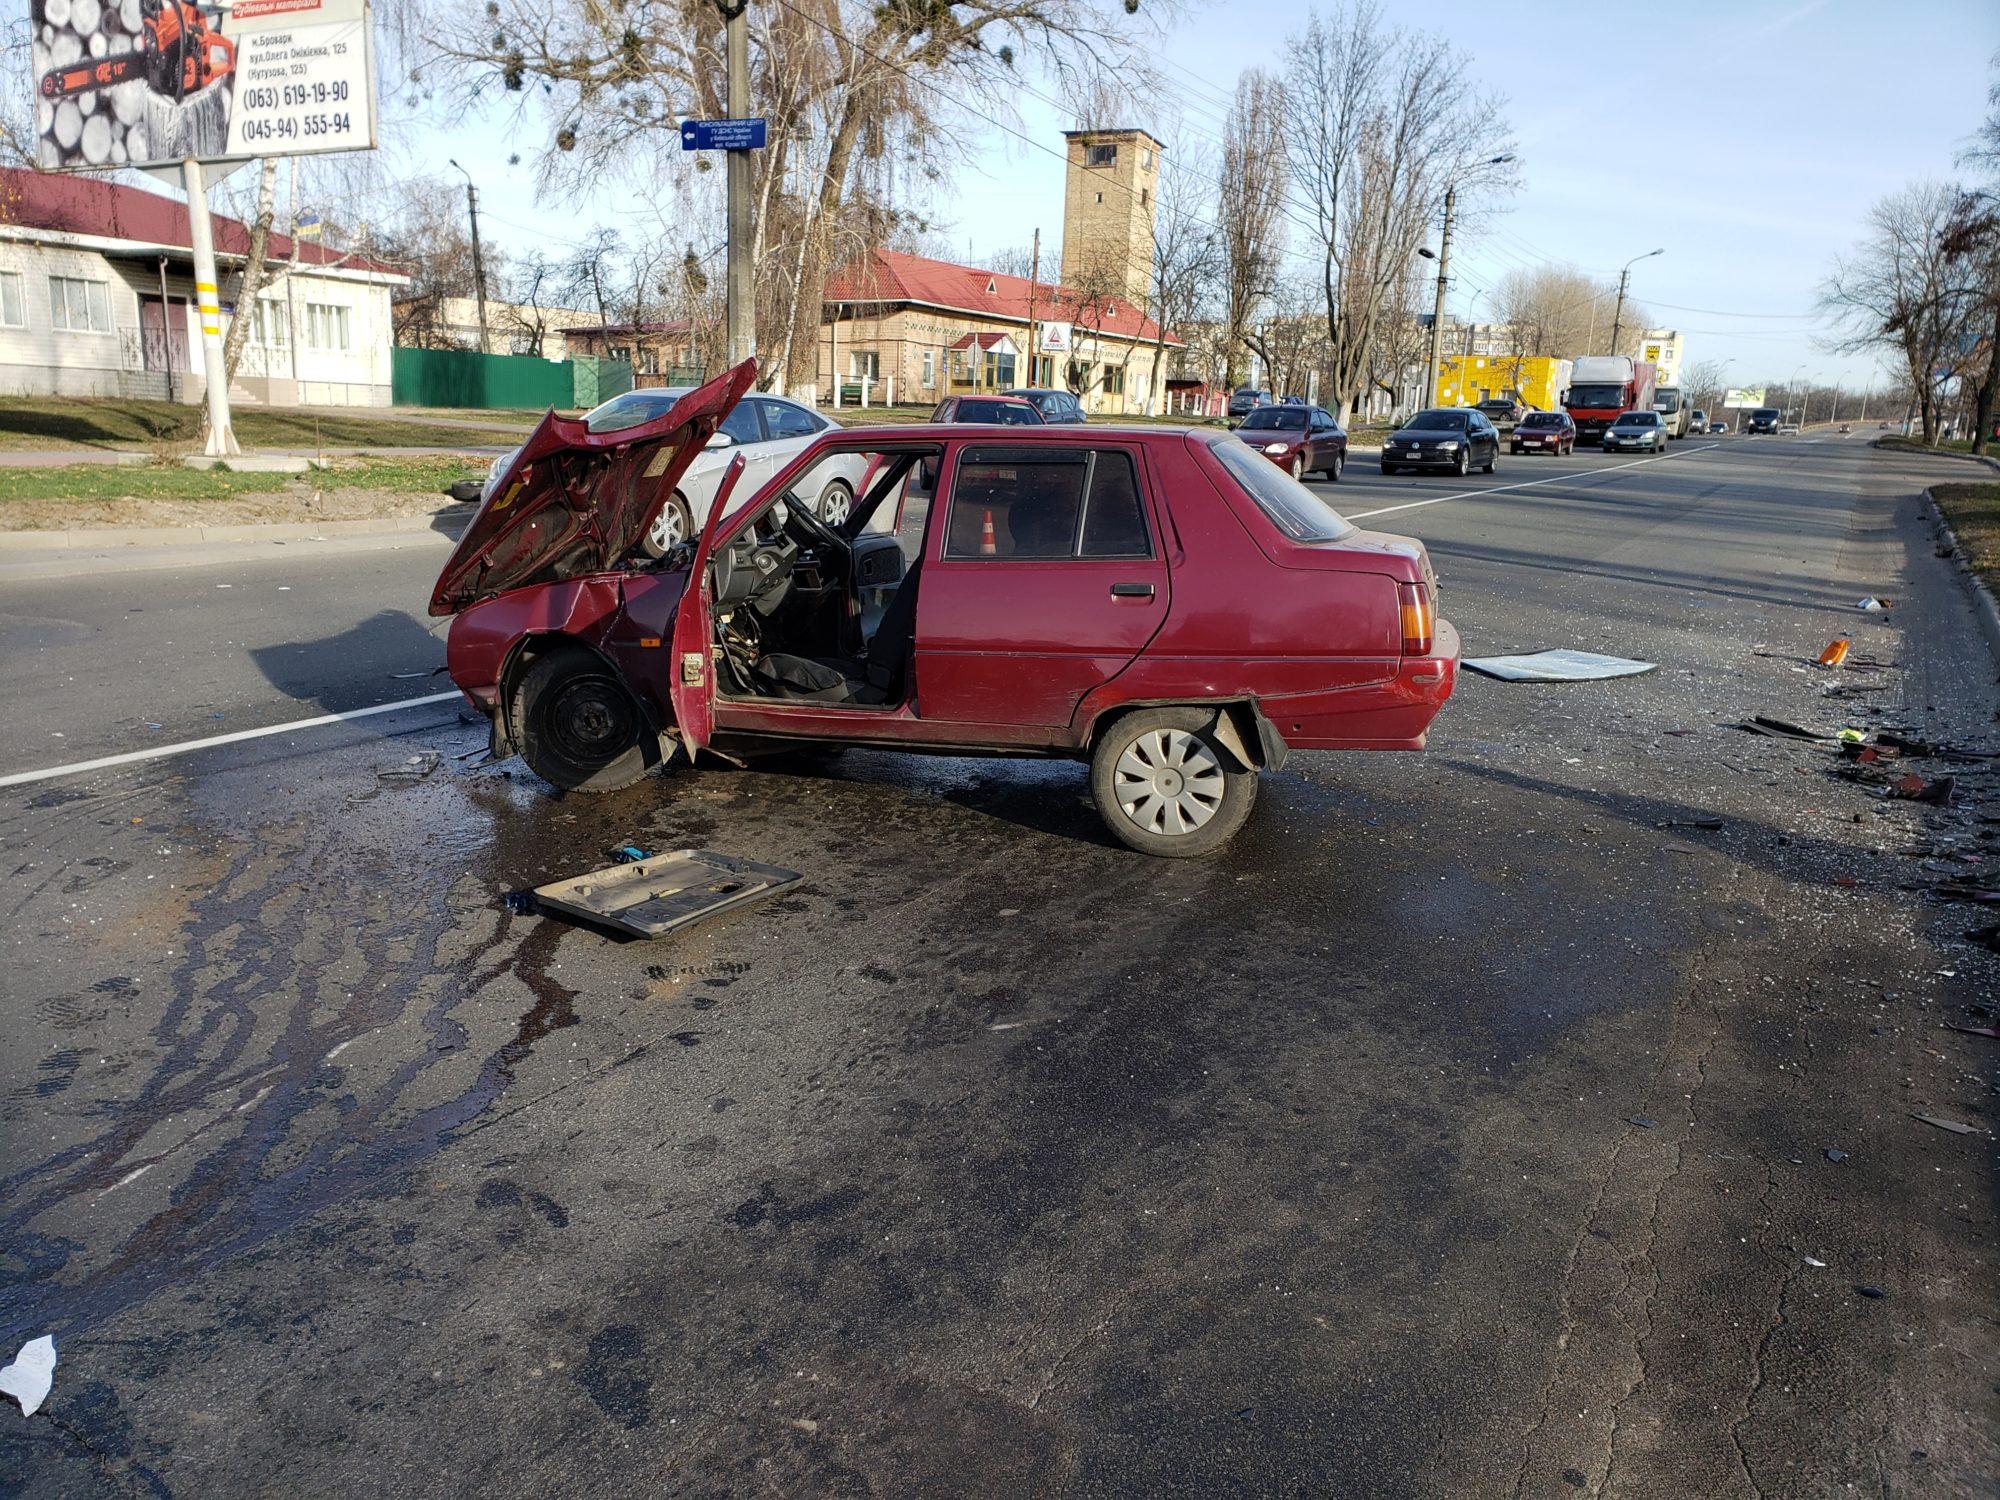 20191123_112840-2000x1500 Славута&Mercedes: у Броварах сталася ДТП